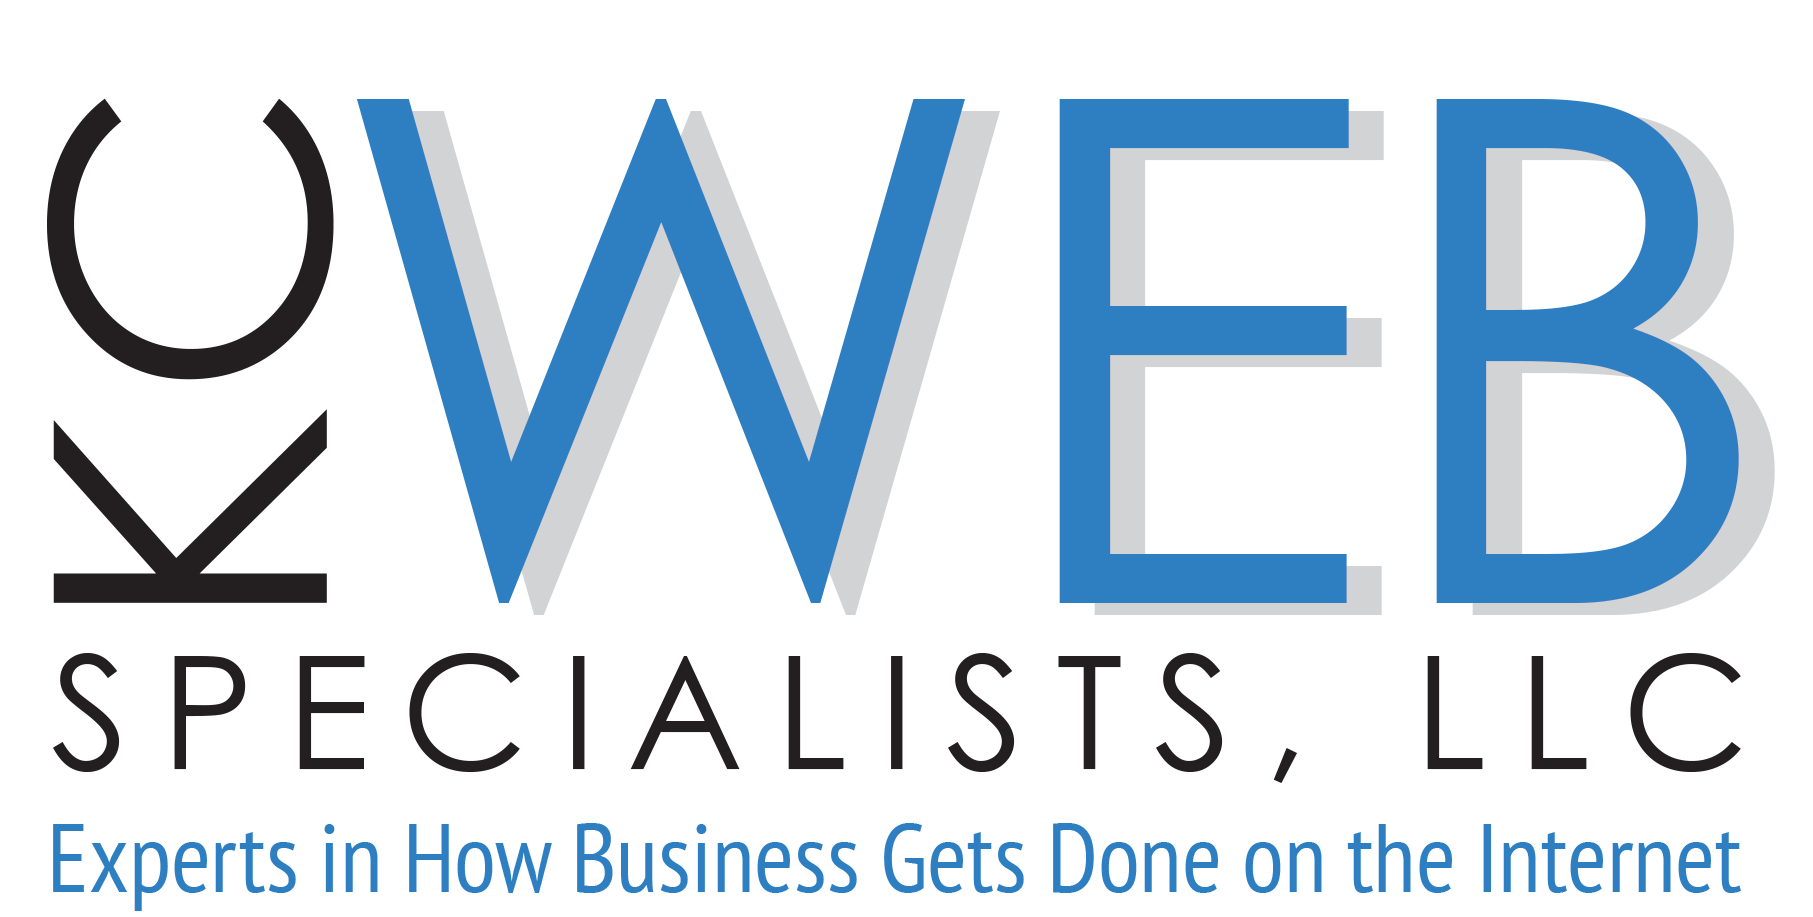 KC-Web-Specialists-2021